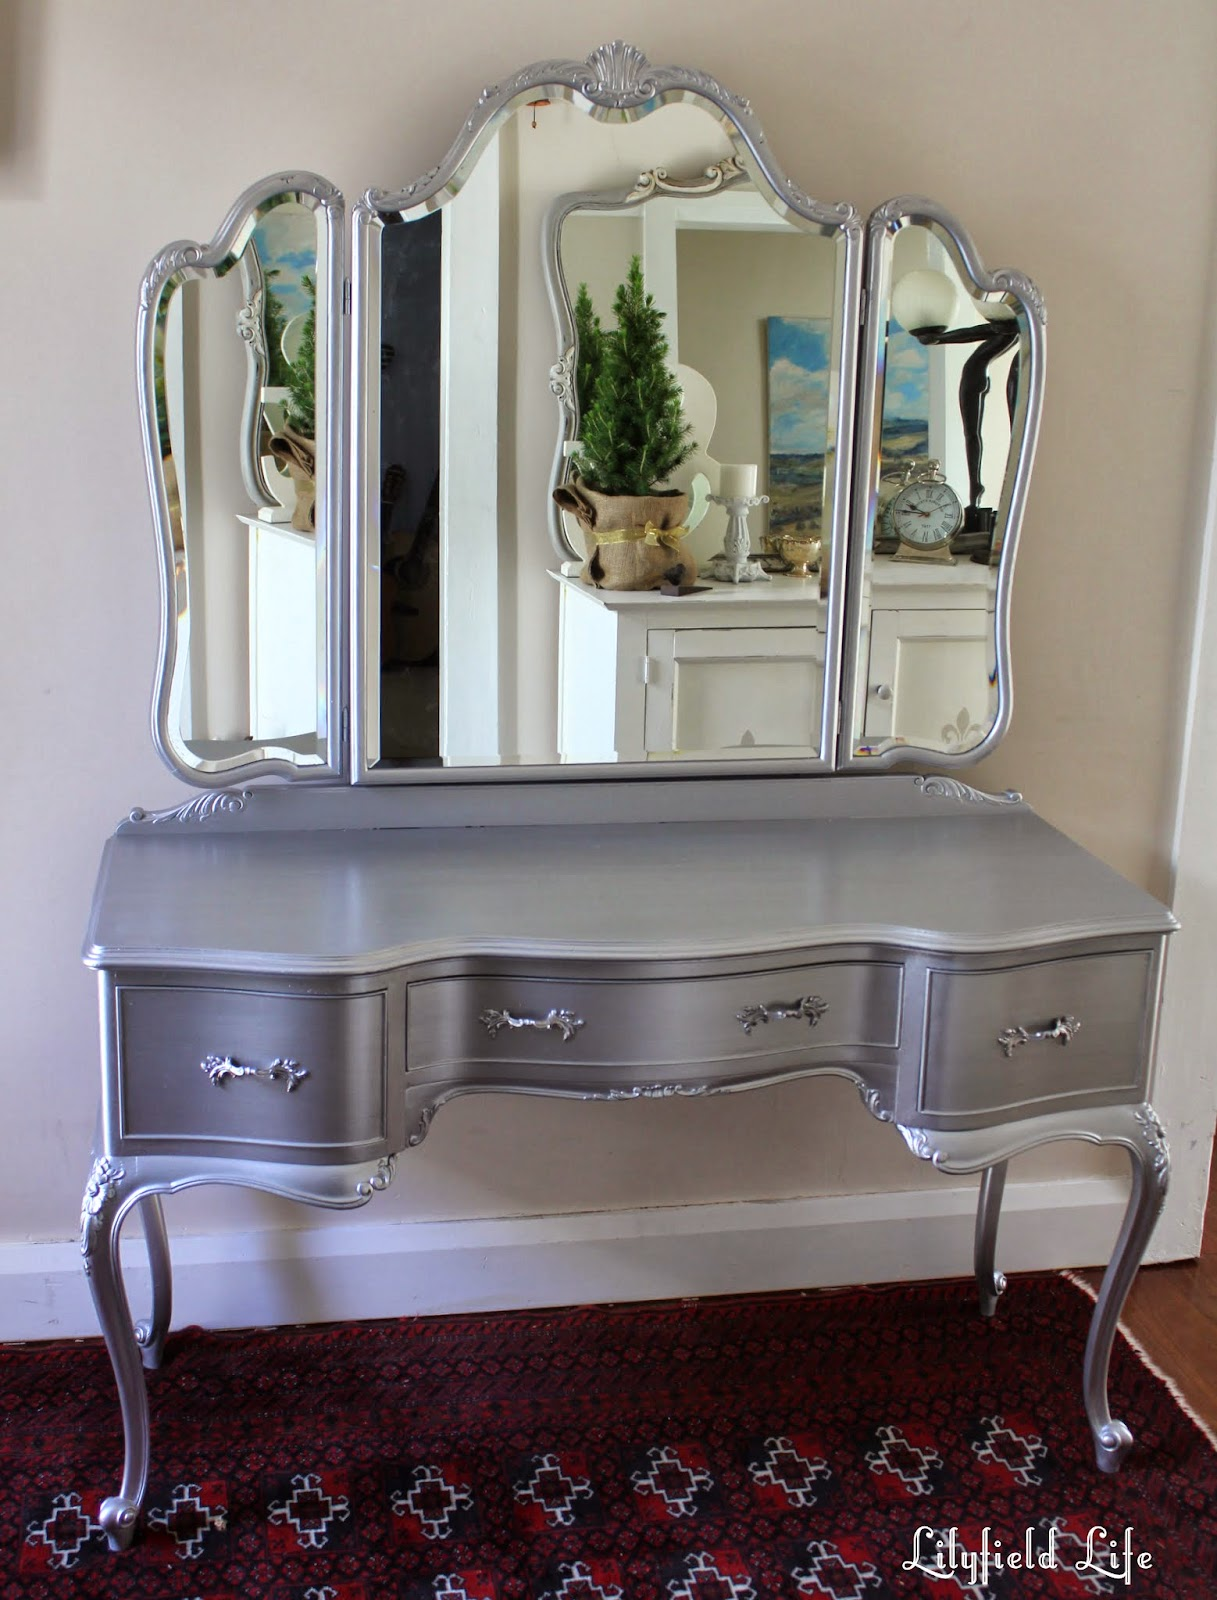 metallic furniture best 25 metallic furniture ideas only on